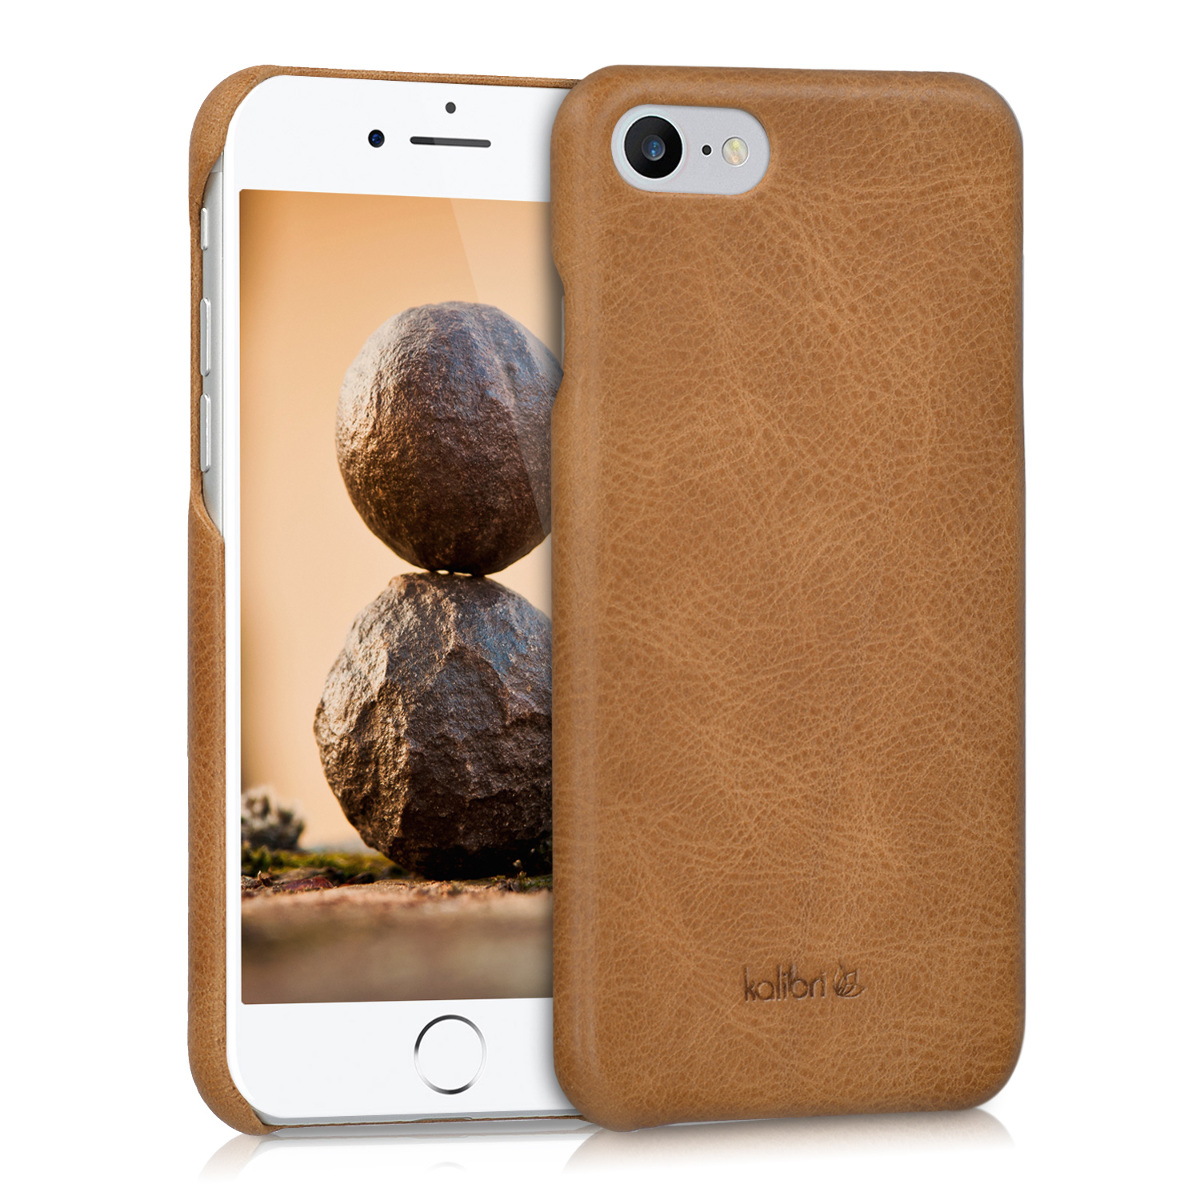 Kalibri Σκληρή Δερμάτινη Θήκη iPhone 7/8 - Cognac (39345.83)